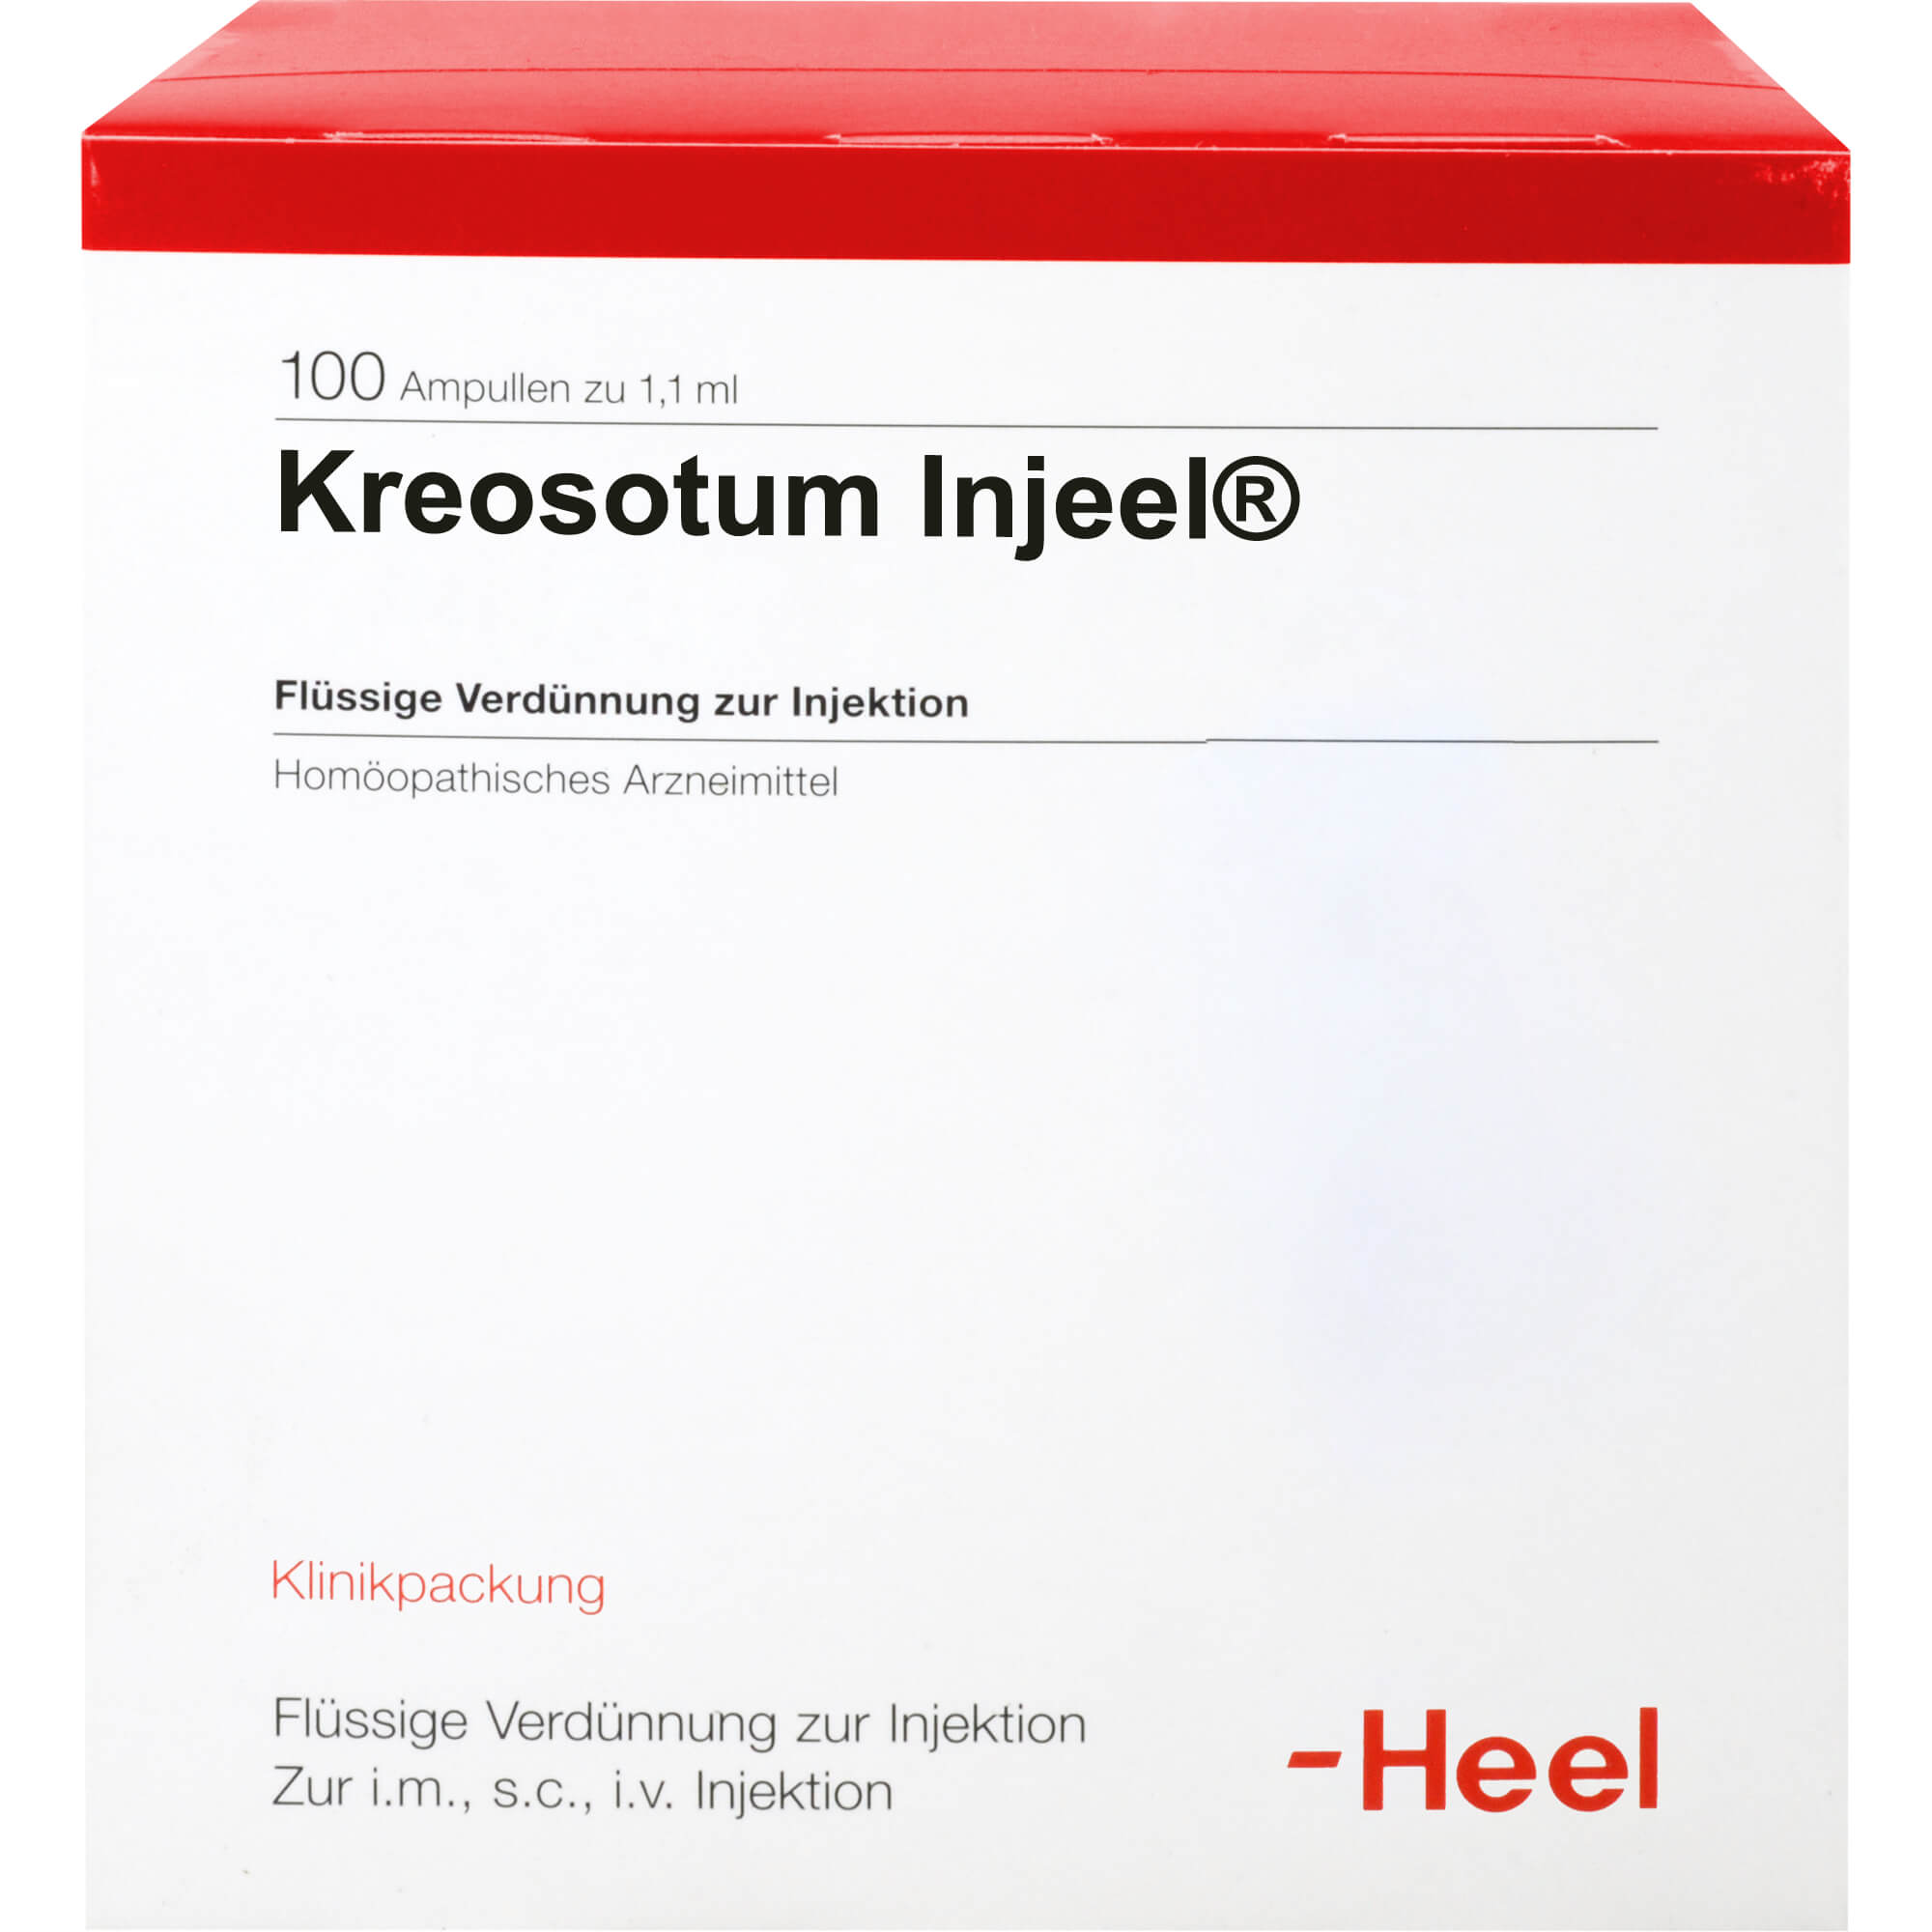 KREOSOTUM-INJEEL-Ampullen